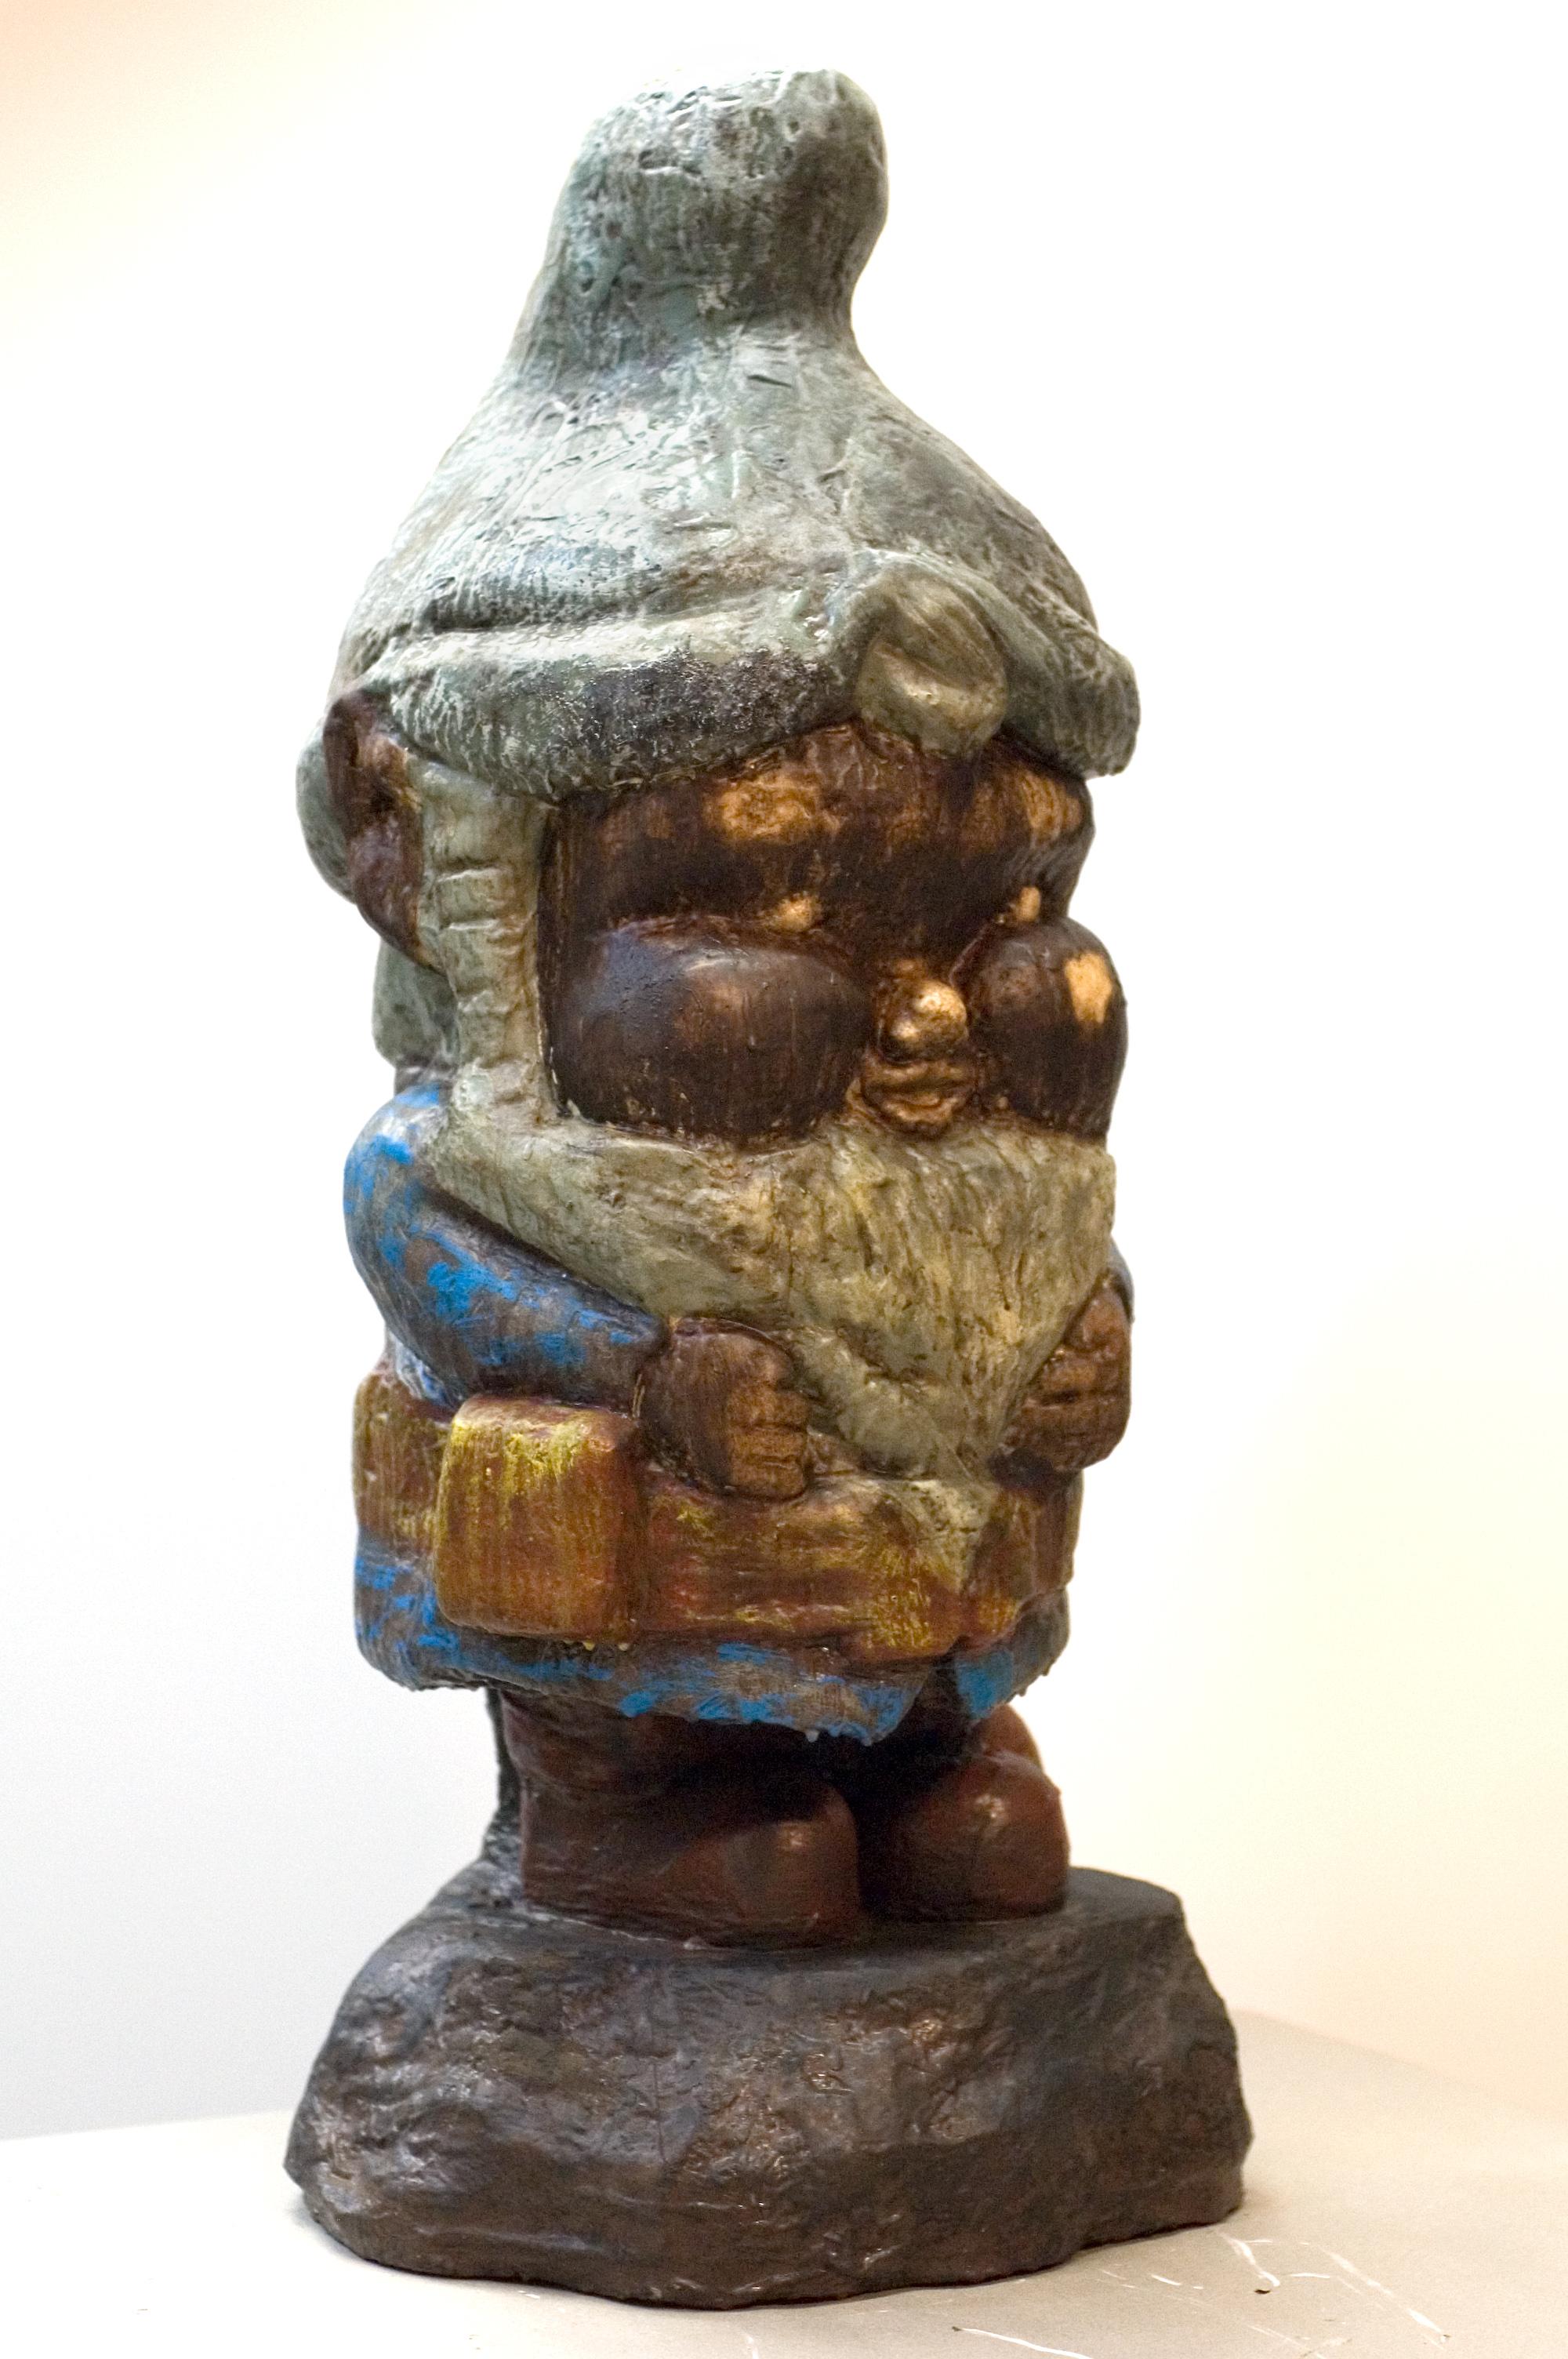 Three-foot tall garden gnome